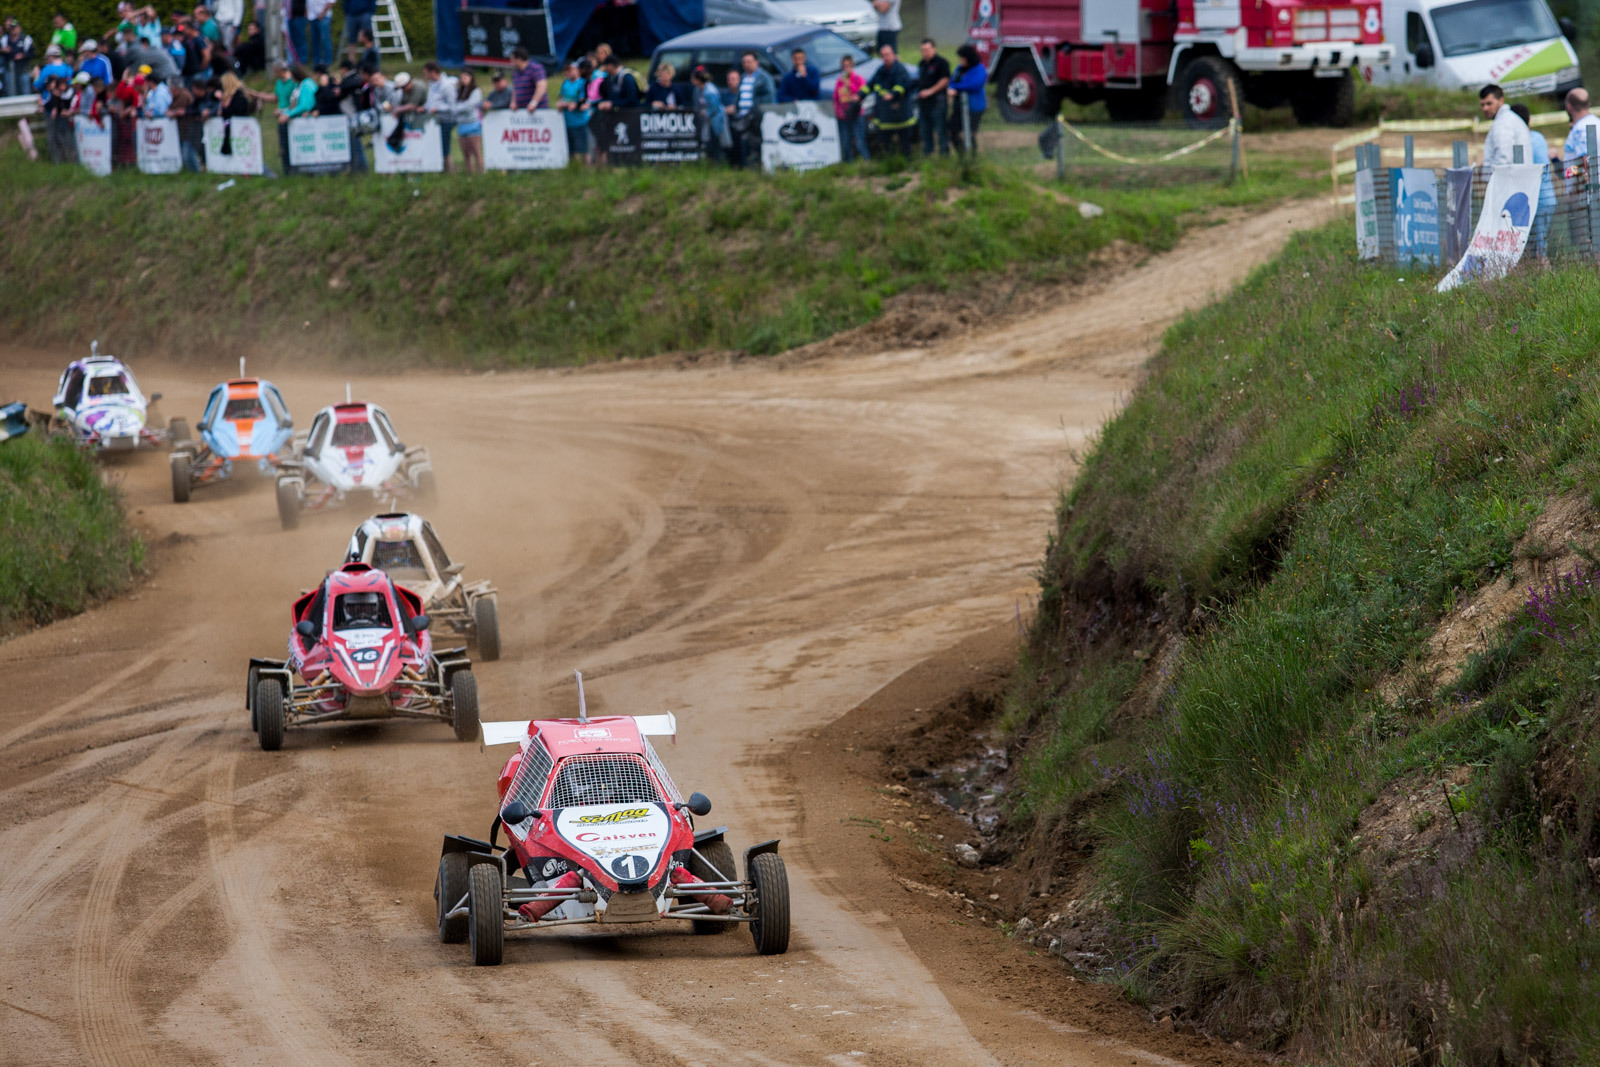 006 Autocross Carballo RFEDA 2016 033